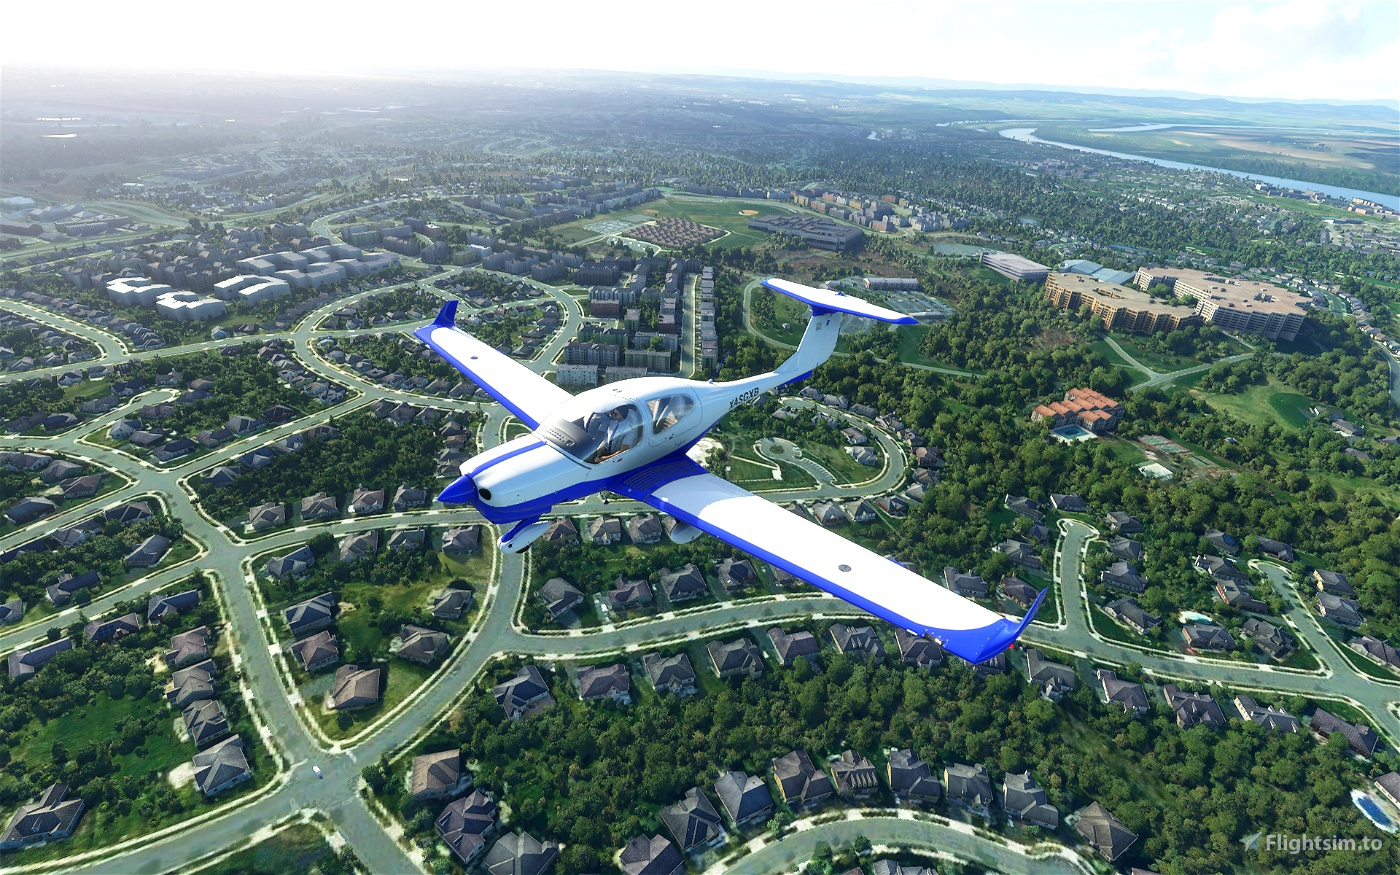 Diamond DA40-NG - Explorer (5 colors) Flight Simulator 2020